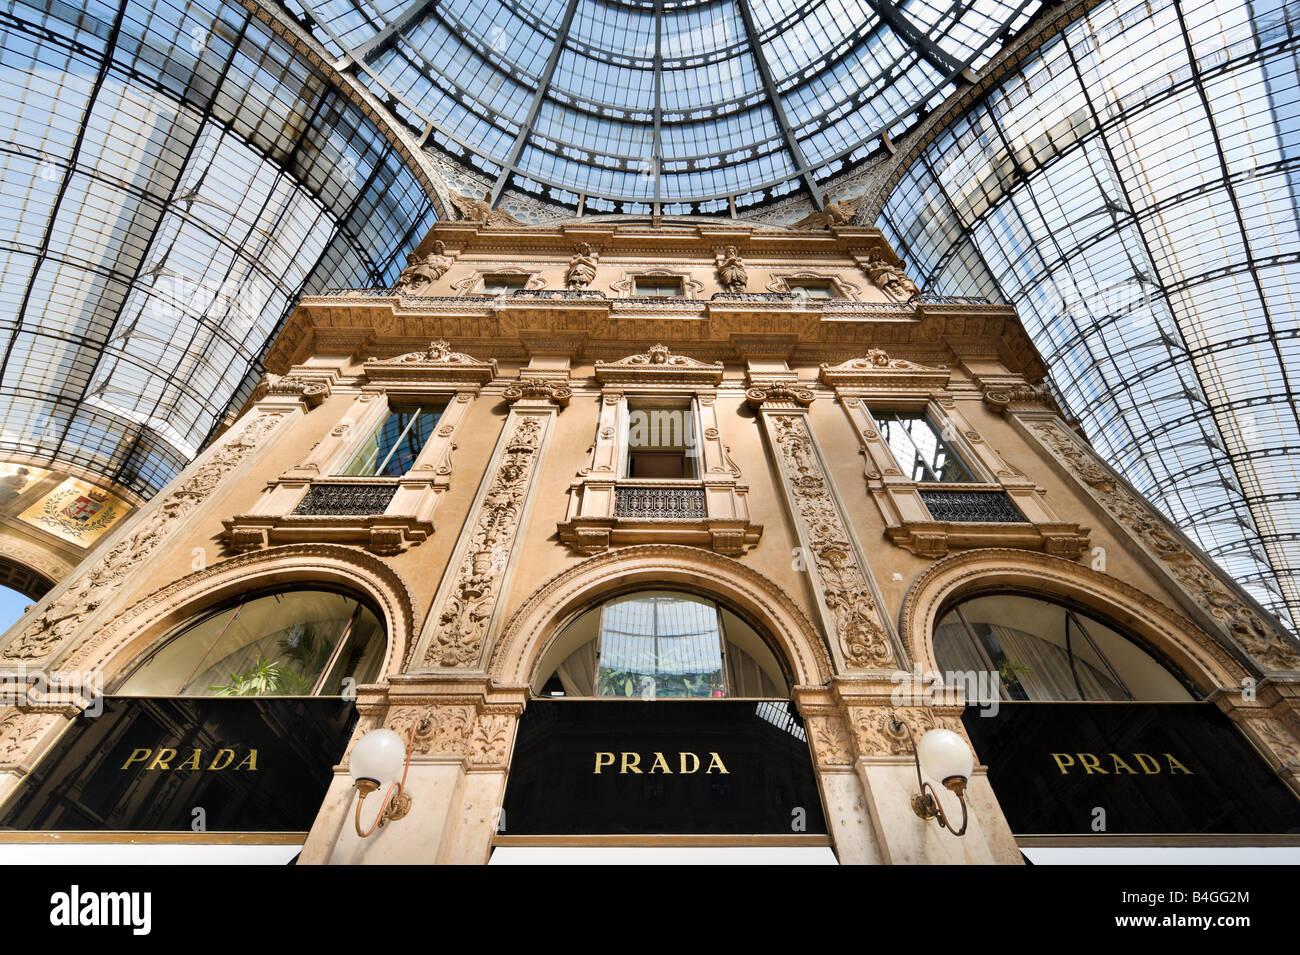 Prada Store in the Galleria Vittorio Emmanuele II, Milan, Lombardy, Italy - Stock Image